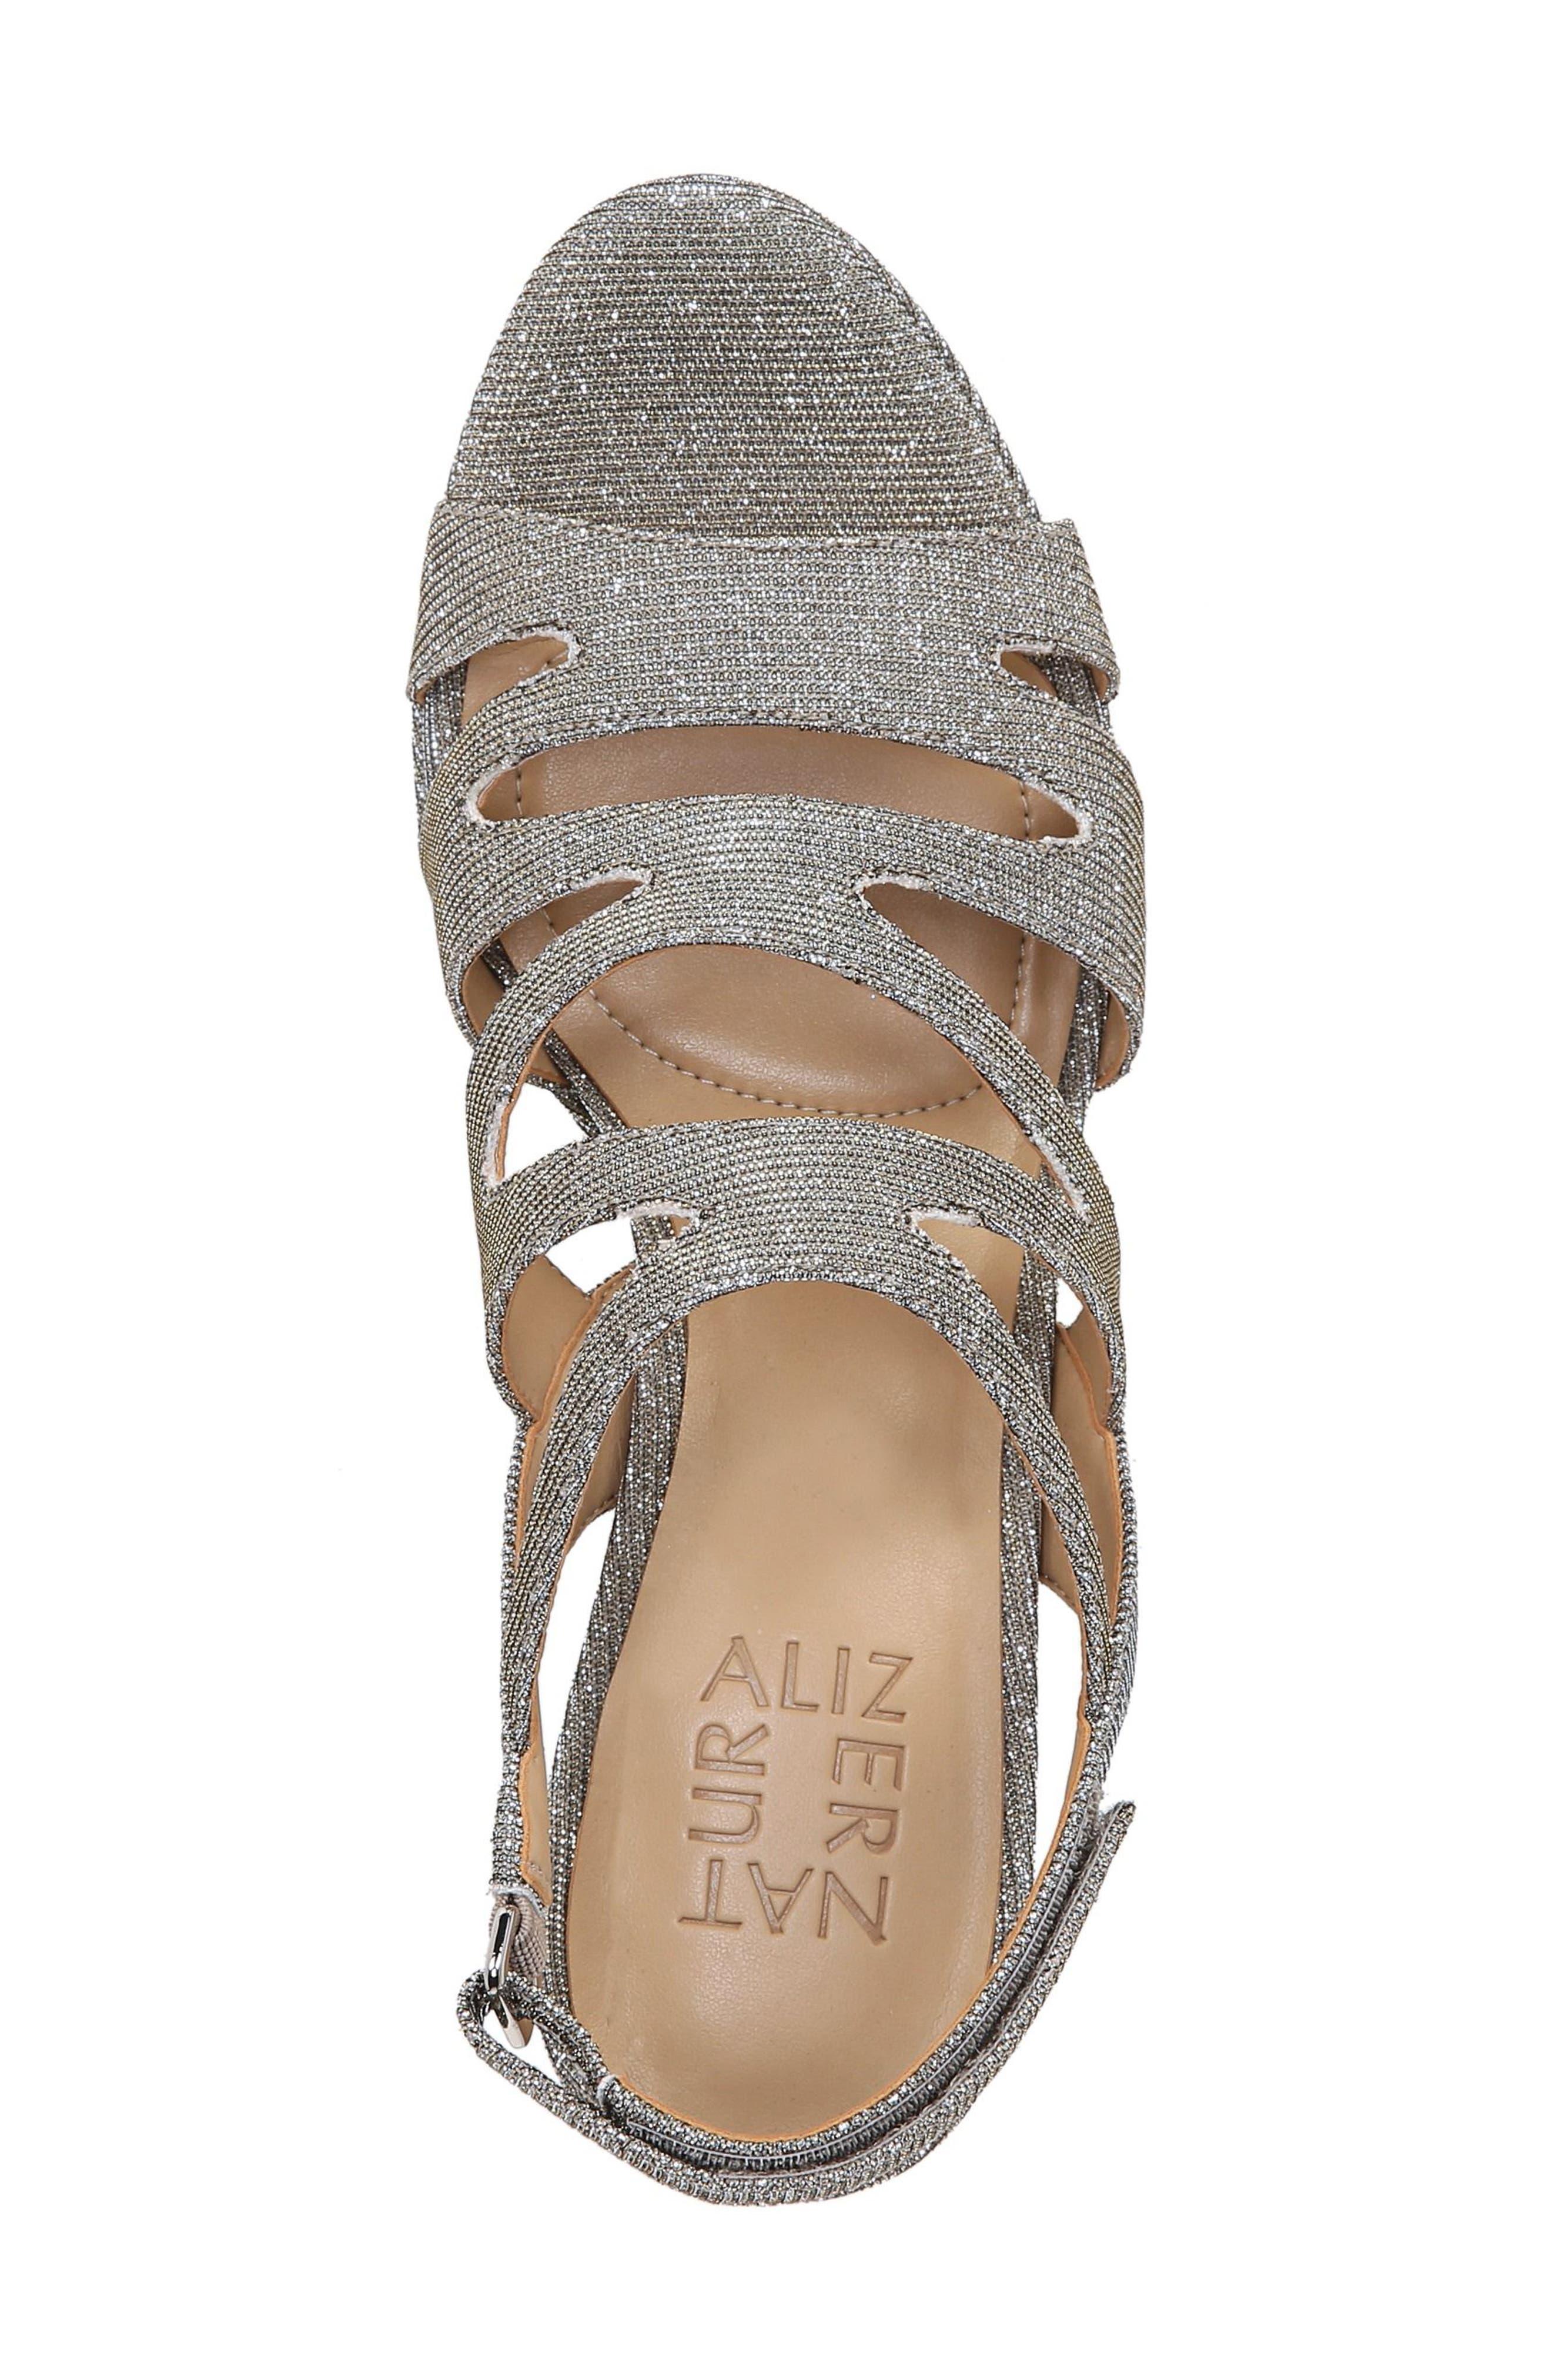 'Pressley' Slingback Platform Sandal,                             Alternate thumbnail 5, color,                             Alloy Sparkle Fabric